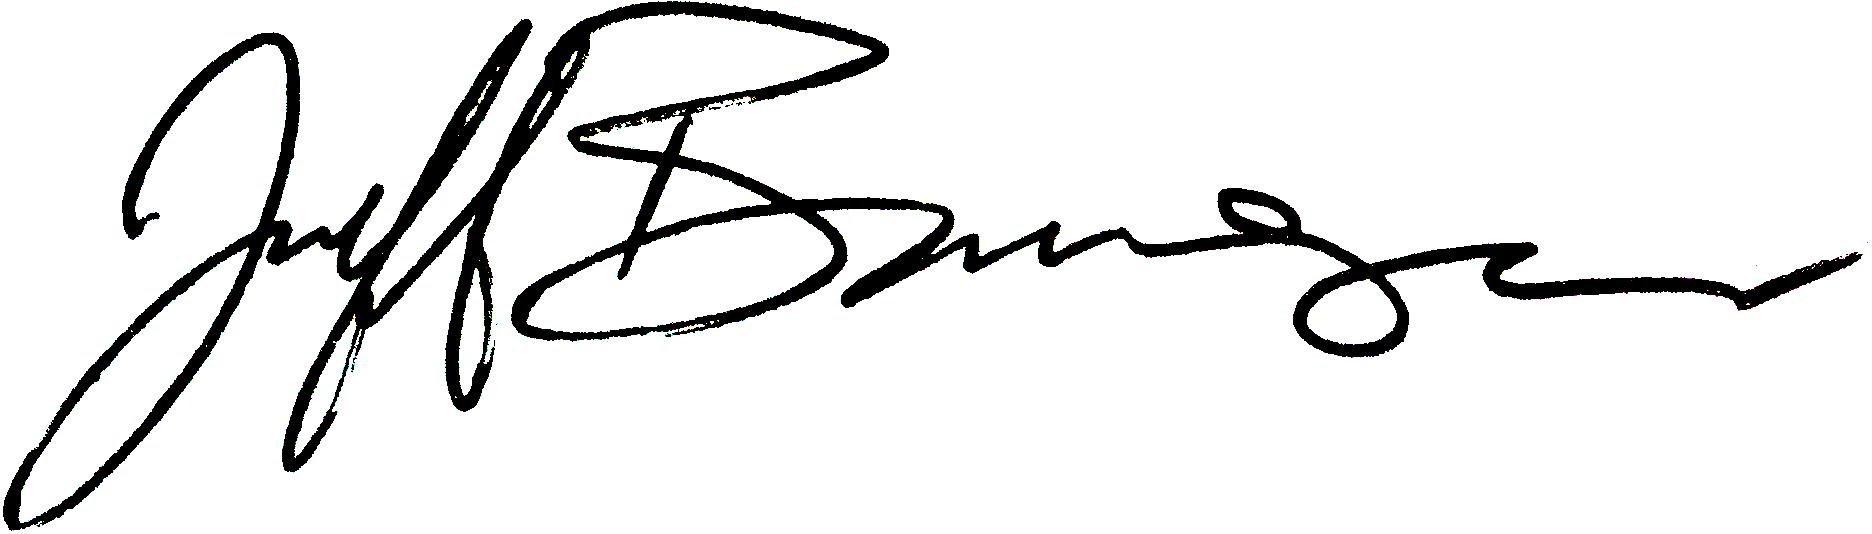 signature-jeffbarson.png